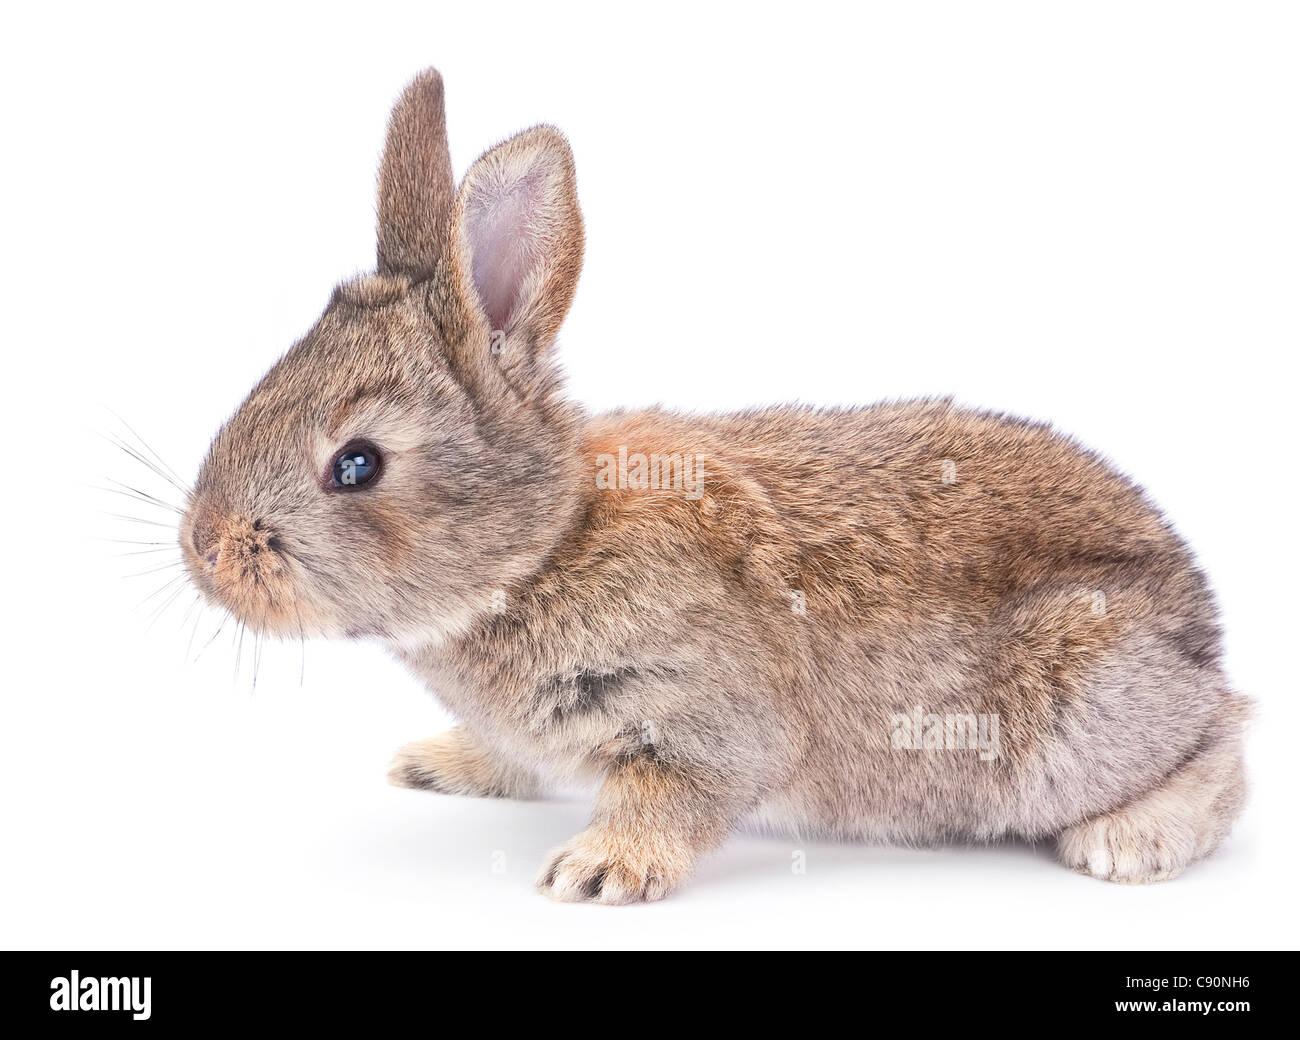 Baby rabbit farm animal closeup on white background - Stock Image